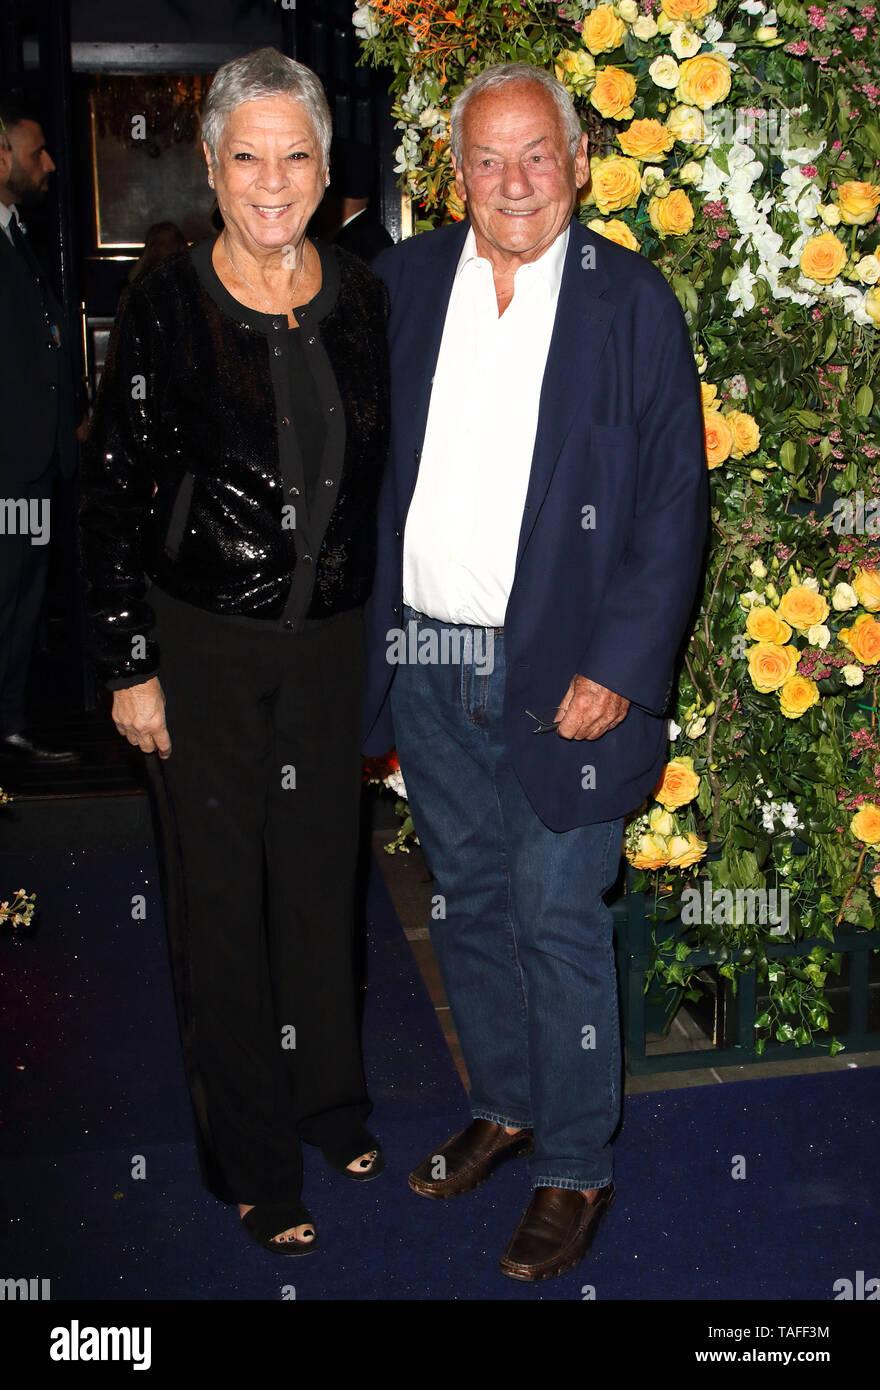 London, UK. Jan and Johnny Gold at Tramp Nightclub 50th Anniversary Party, Jermyn Street, London on May 23rd 2019 Ref: LMK73-J4944-240519 Keith Mayhew/Landmark Media WWW.LMKMEDIA.COM Stock Photo